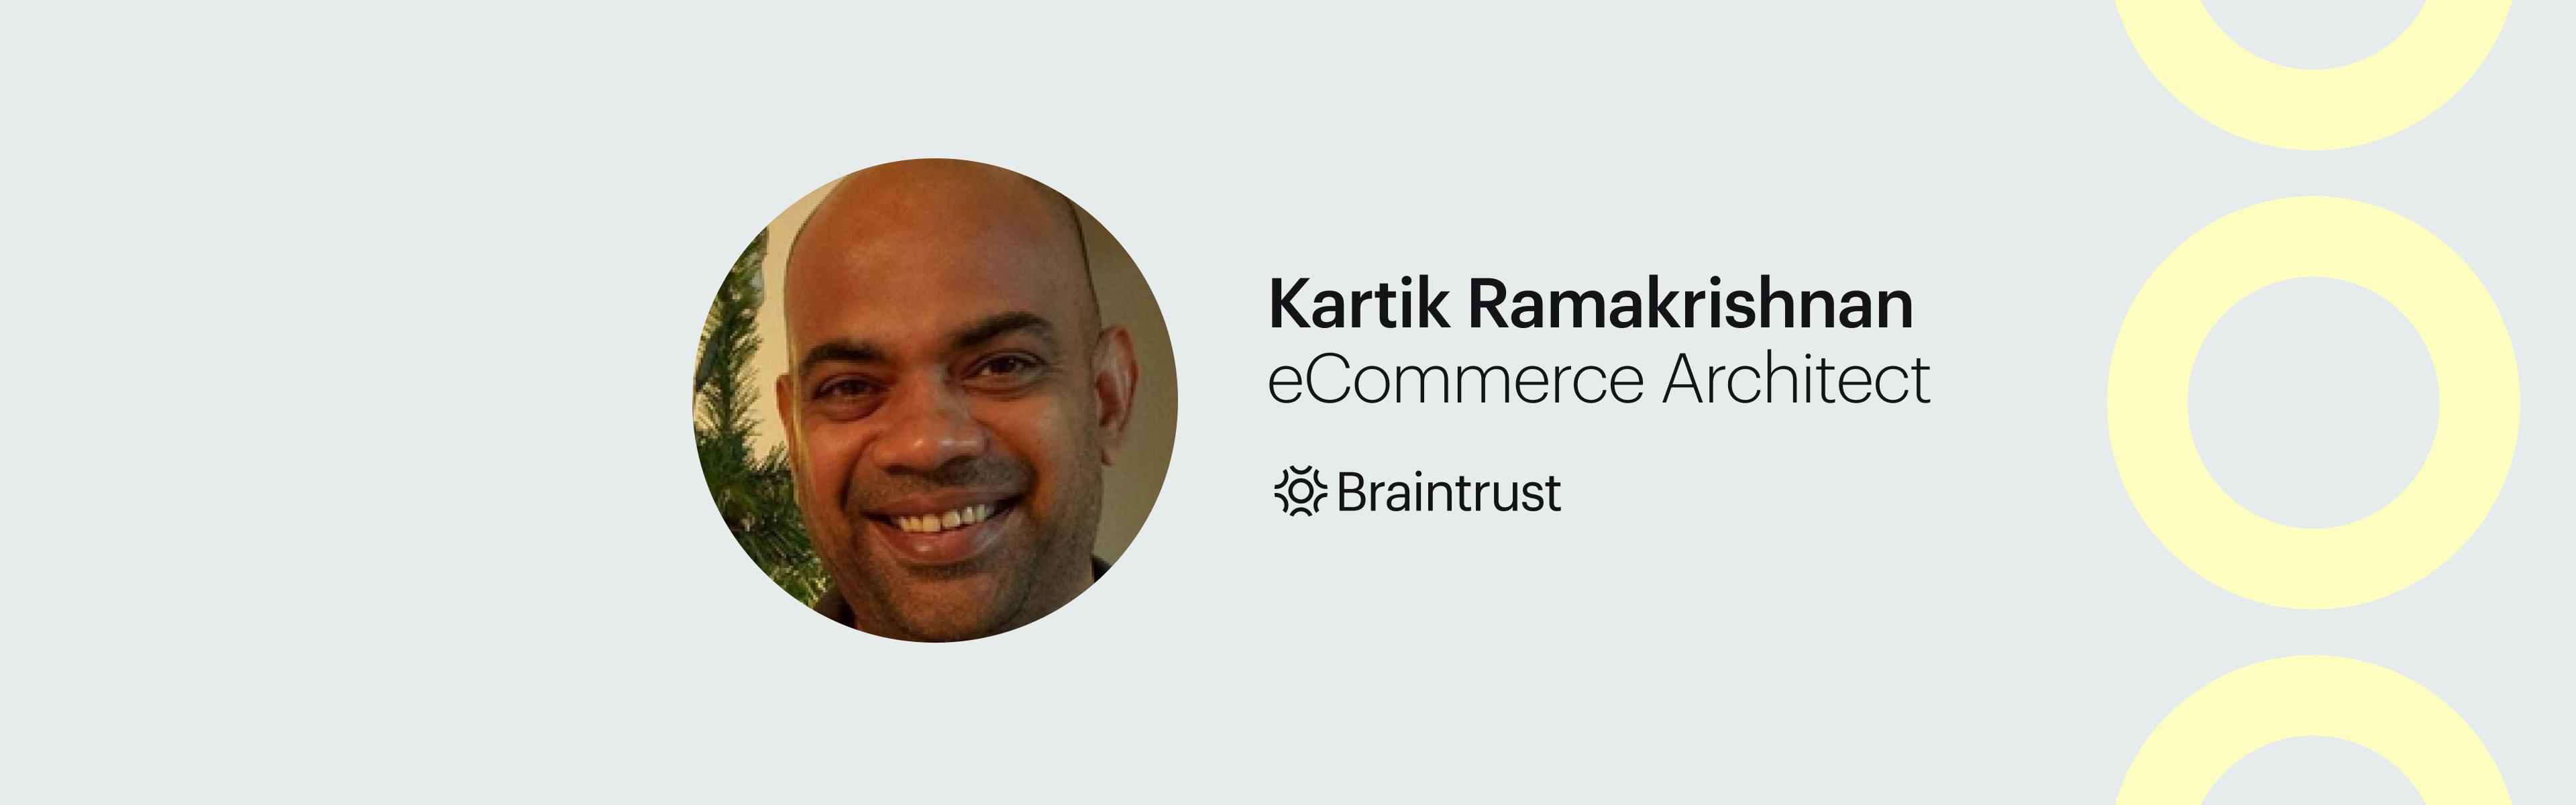 Talent Spotlight_ How Kartik Ramakrishnan, eCommerce Architect, Took Ownership of His Career as a Freelancer. Braintrust Blog Banner